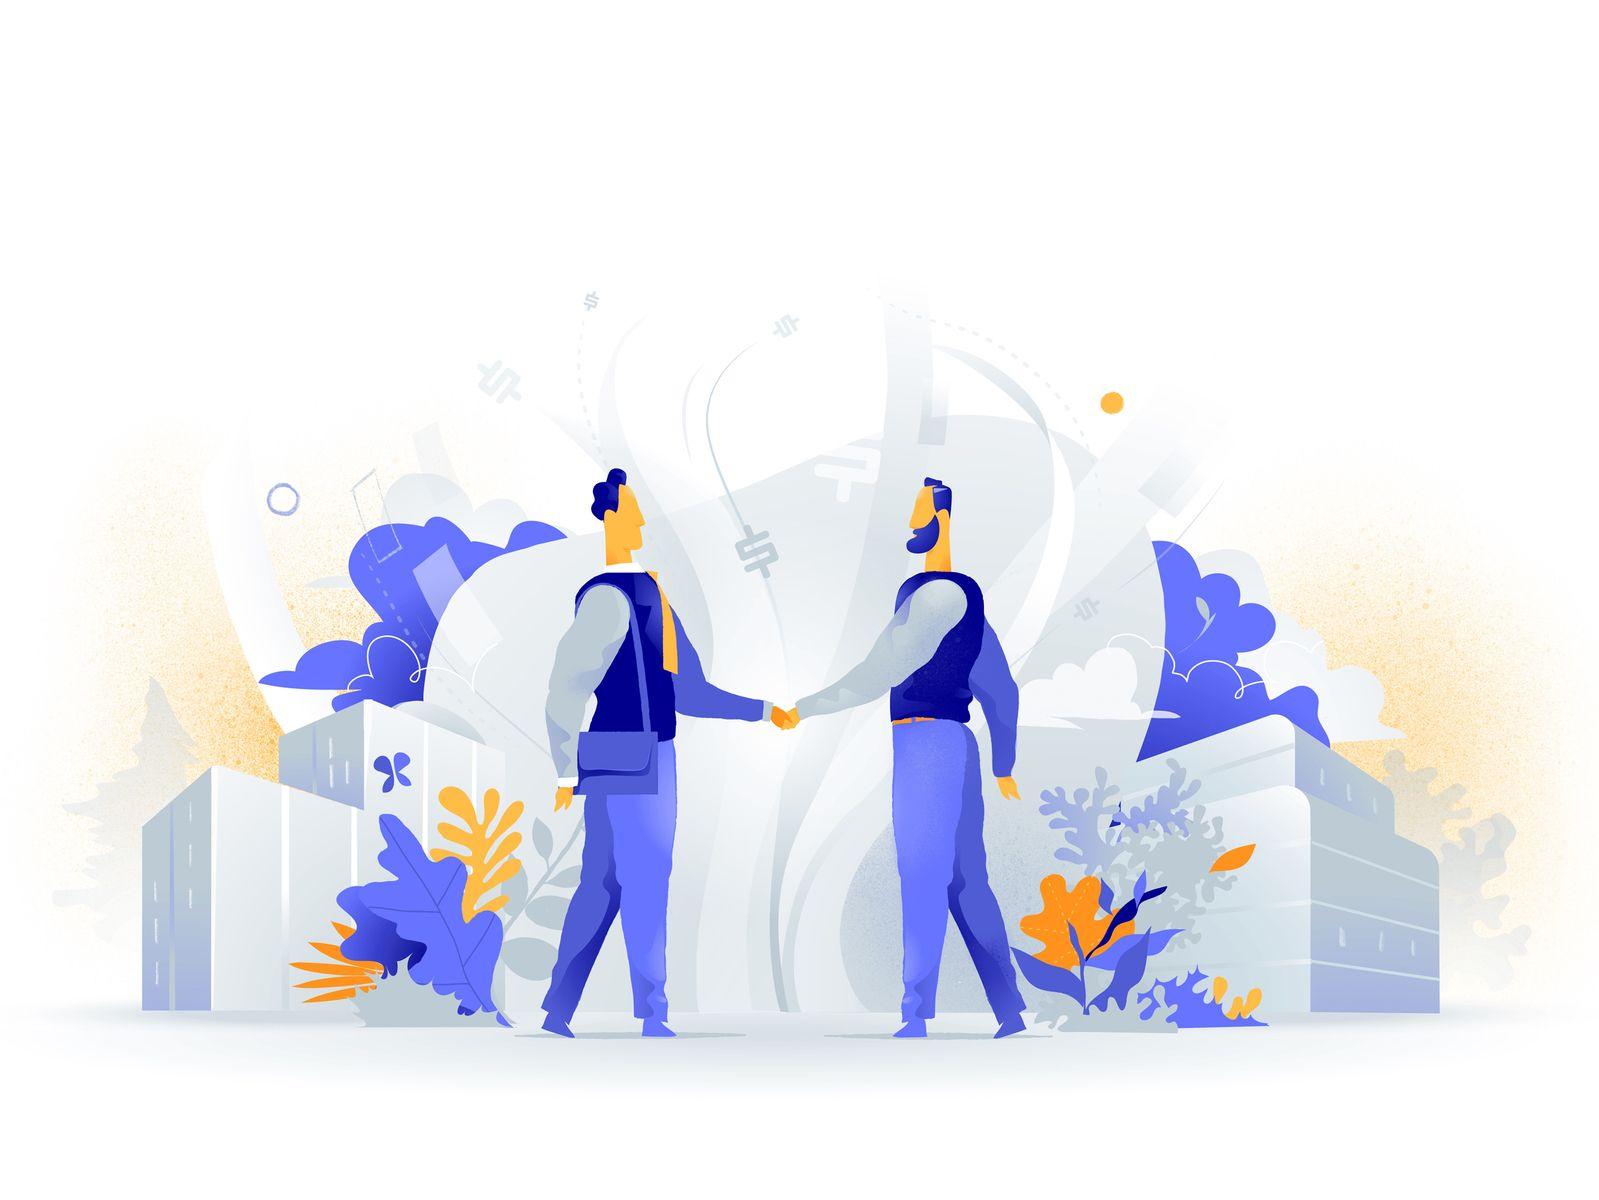 Win Win Agreement | Illustration design, Illustration character design, Business illustration